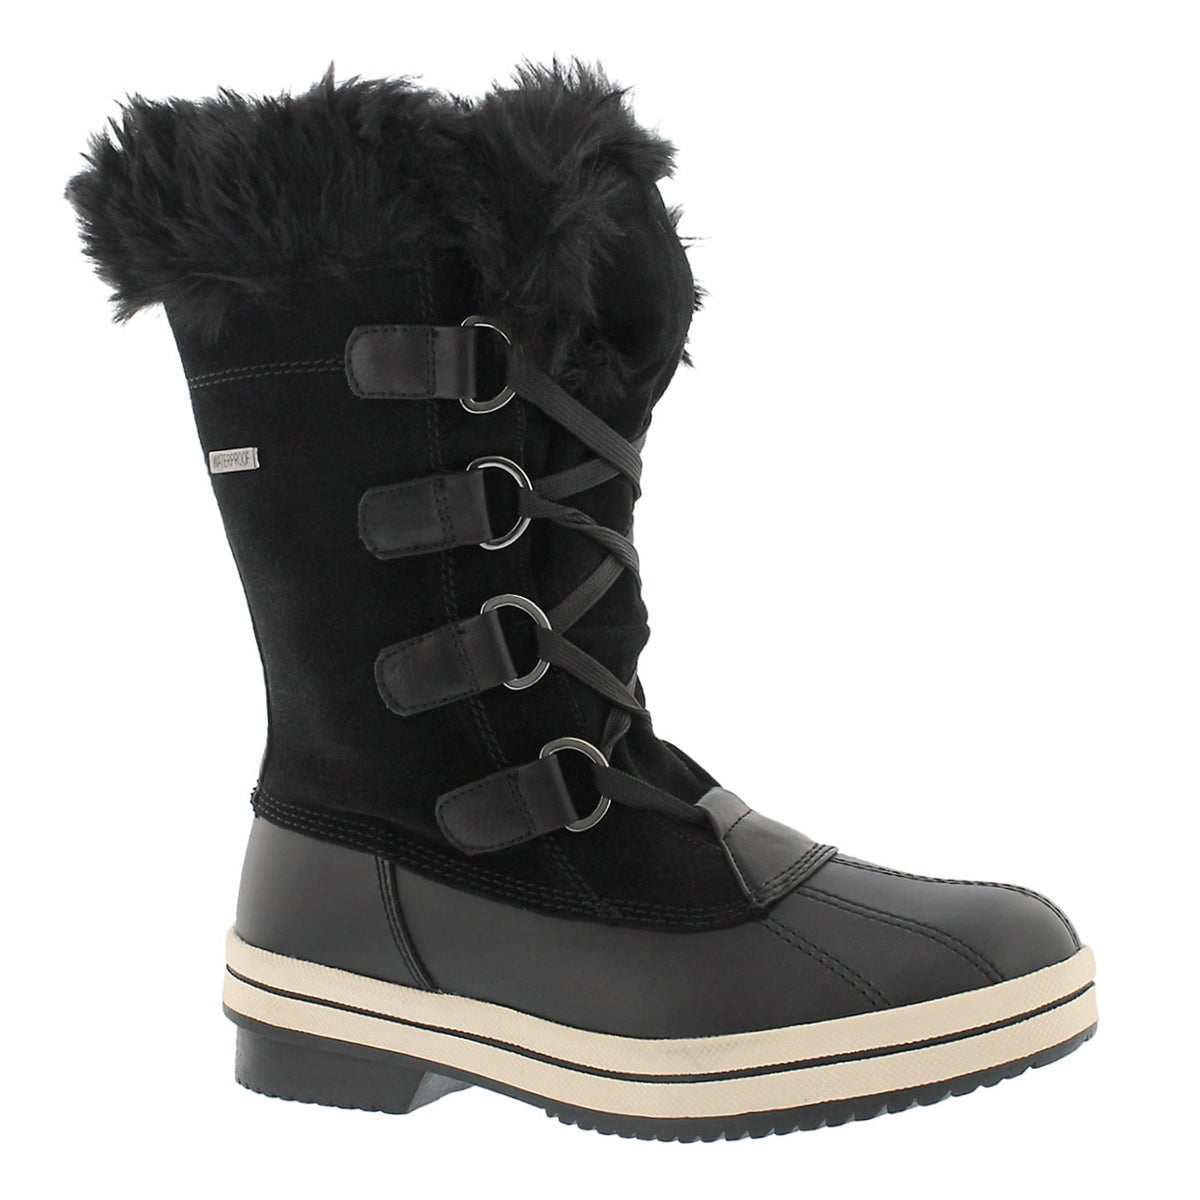 Lds Thunder Bay blk wtpf winter boot